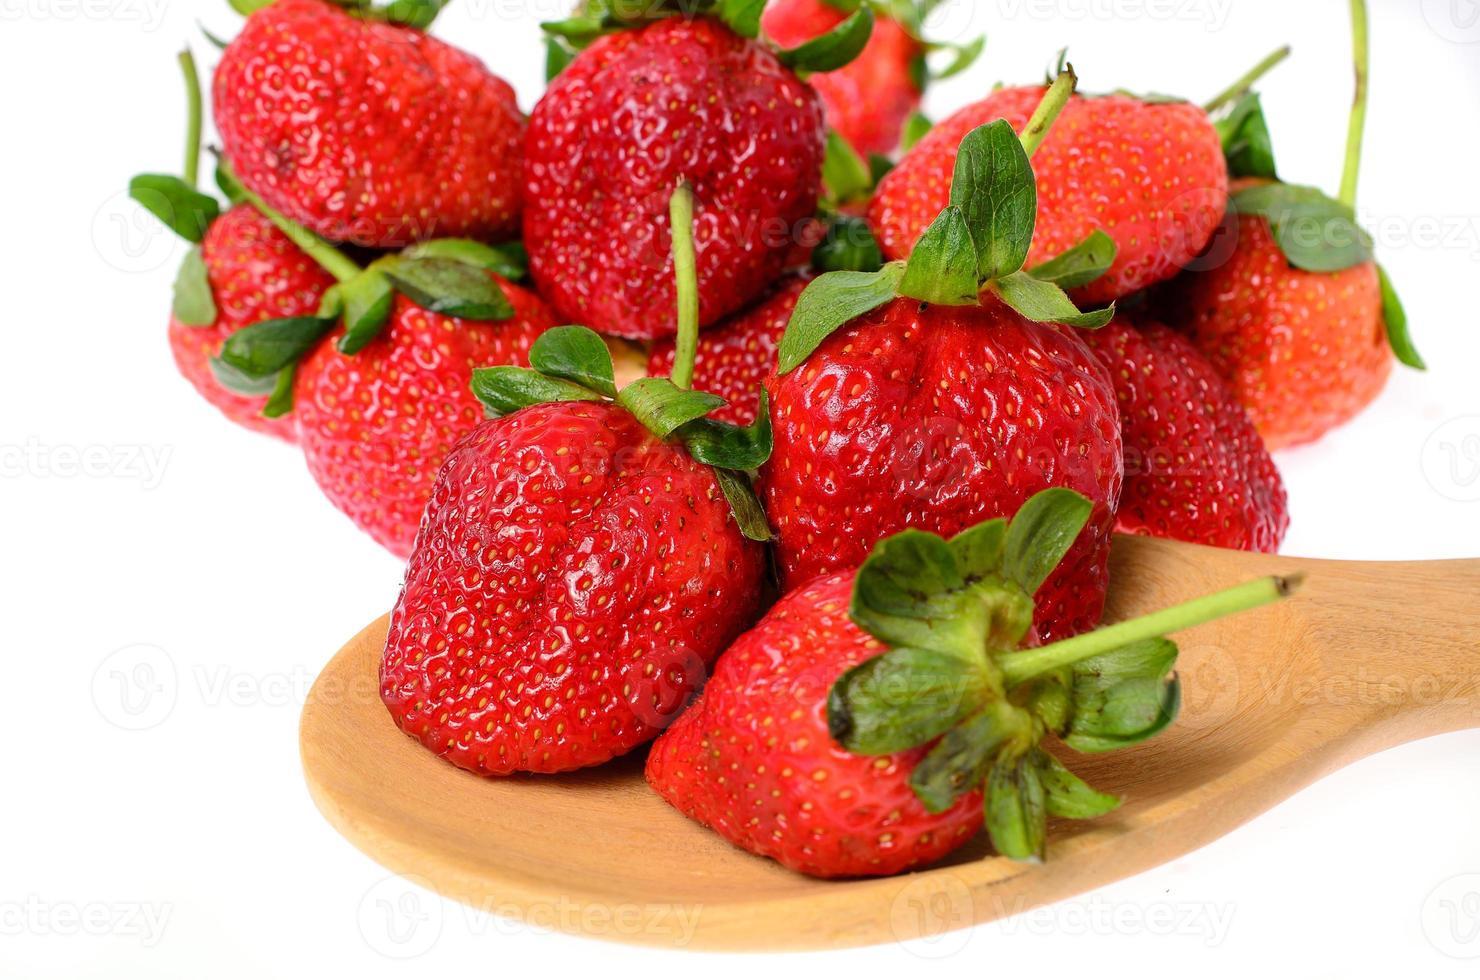 fresas puestas en cuchara wodden foto